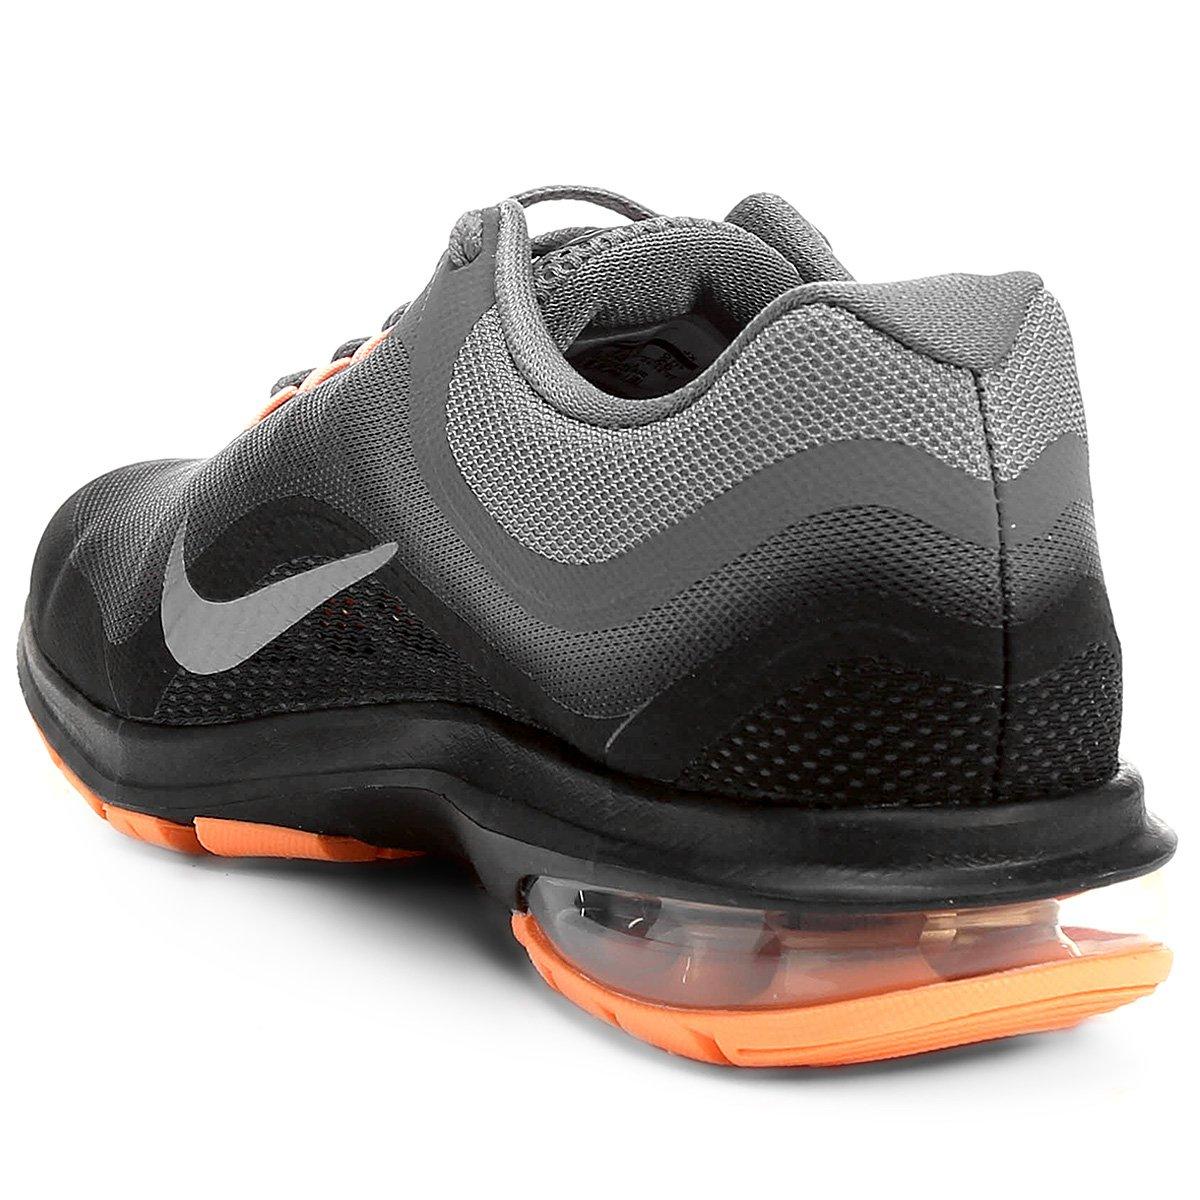 Tênis Nike Air Max Dynasty 2 Feminino - Cinza e Preto - Compre Agora ... 4eb3107d477cf